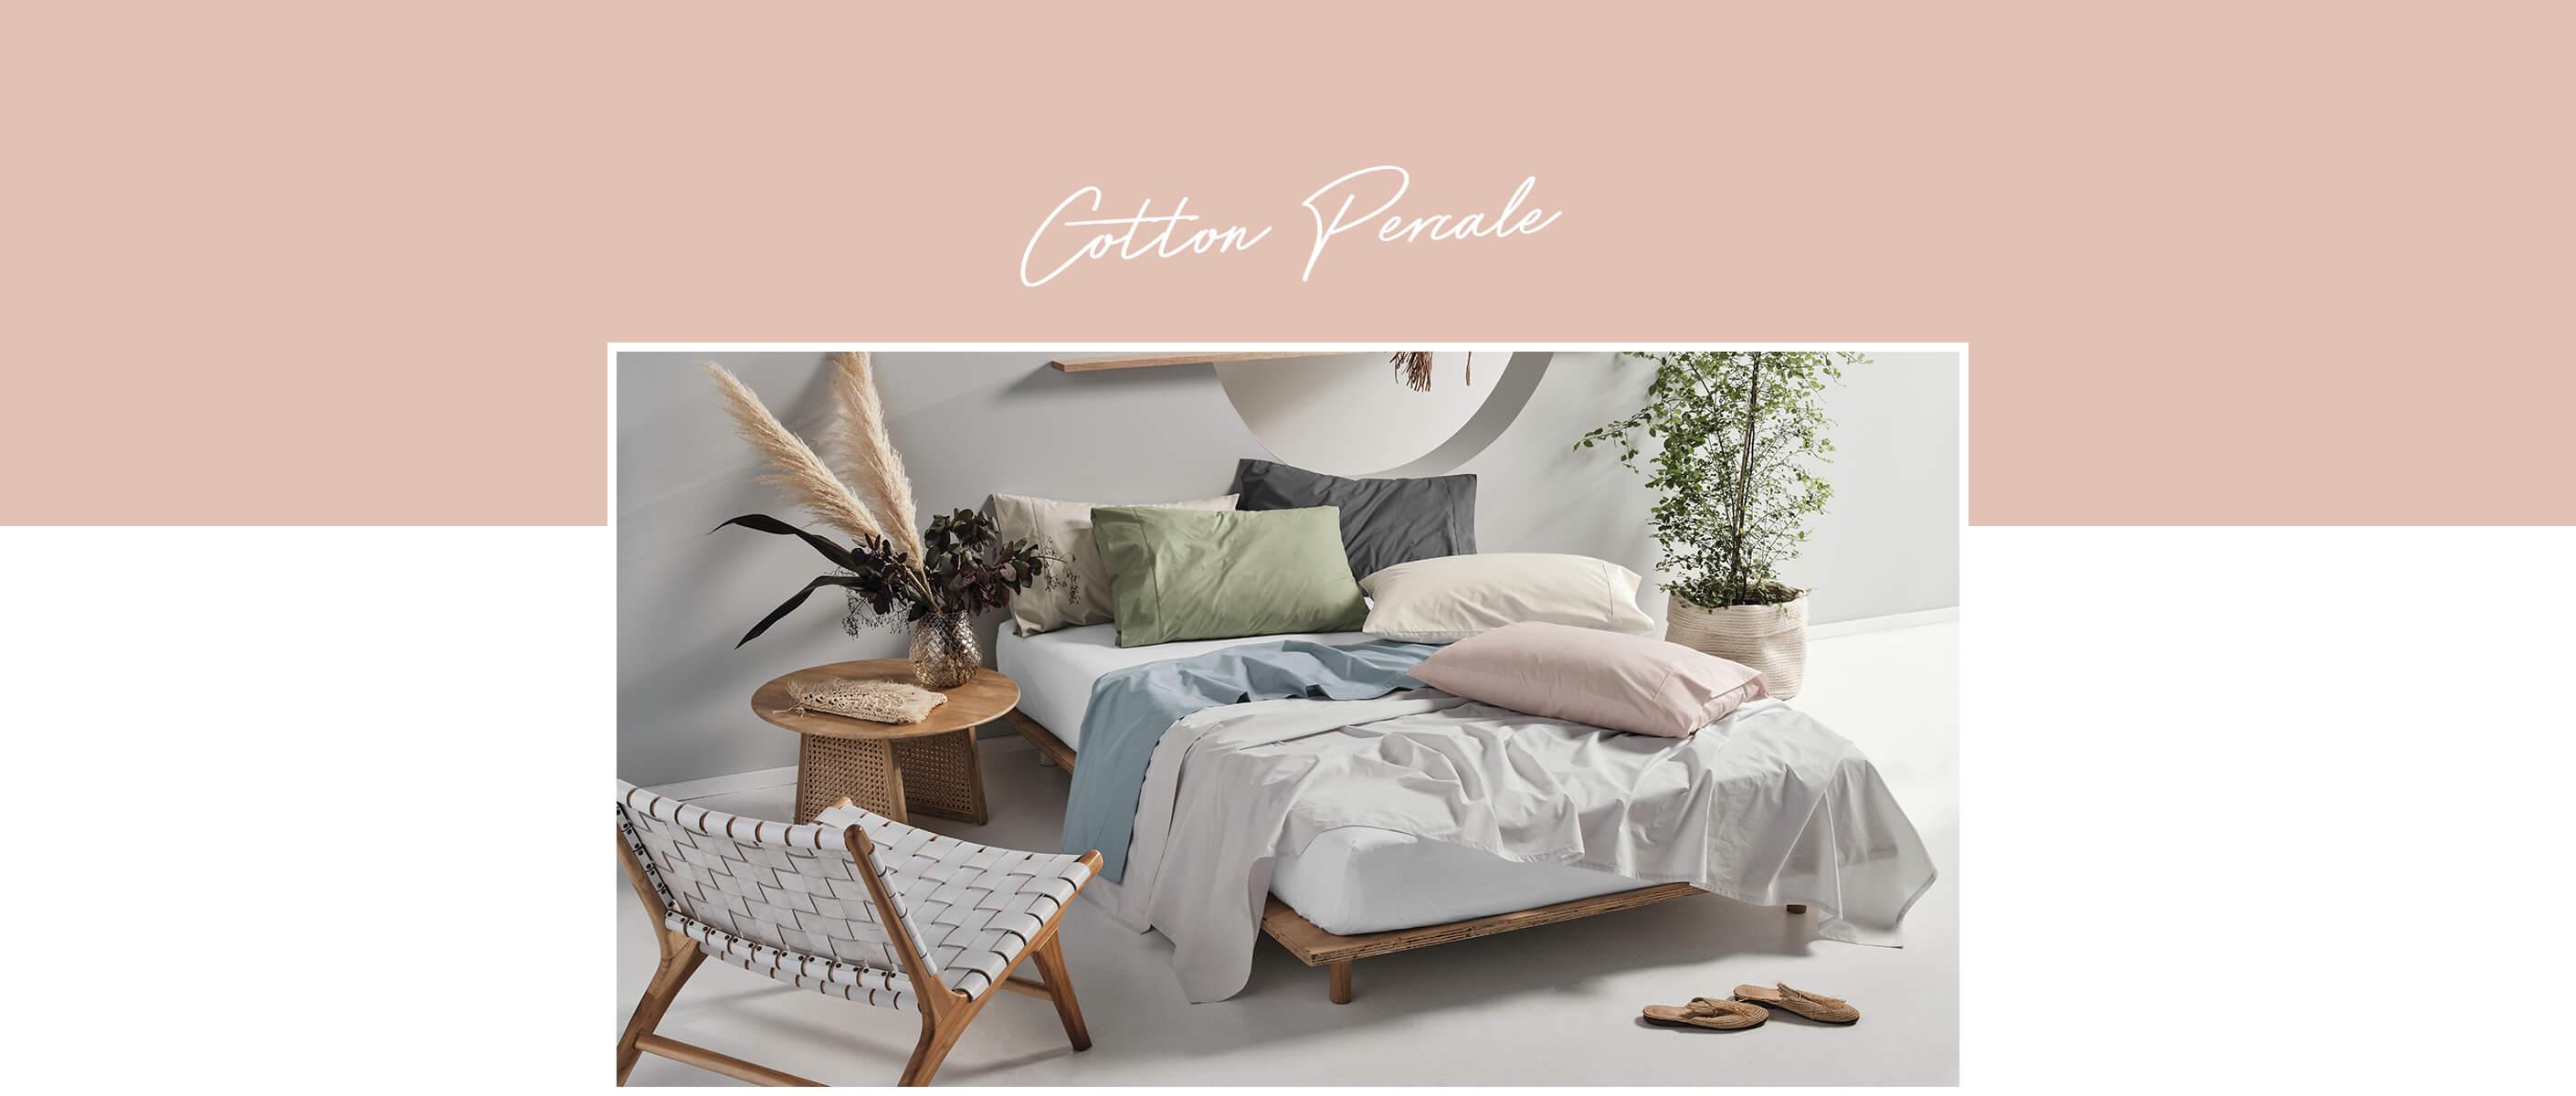 Cotton Percale